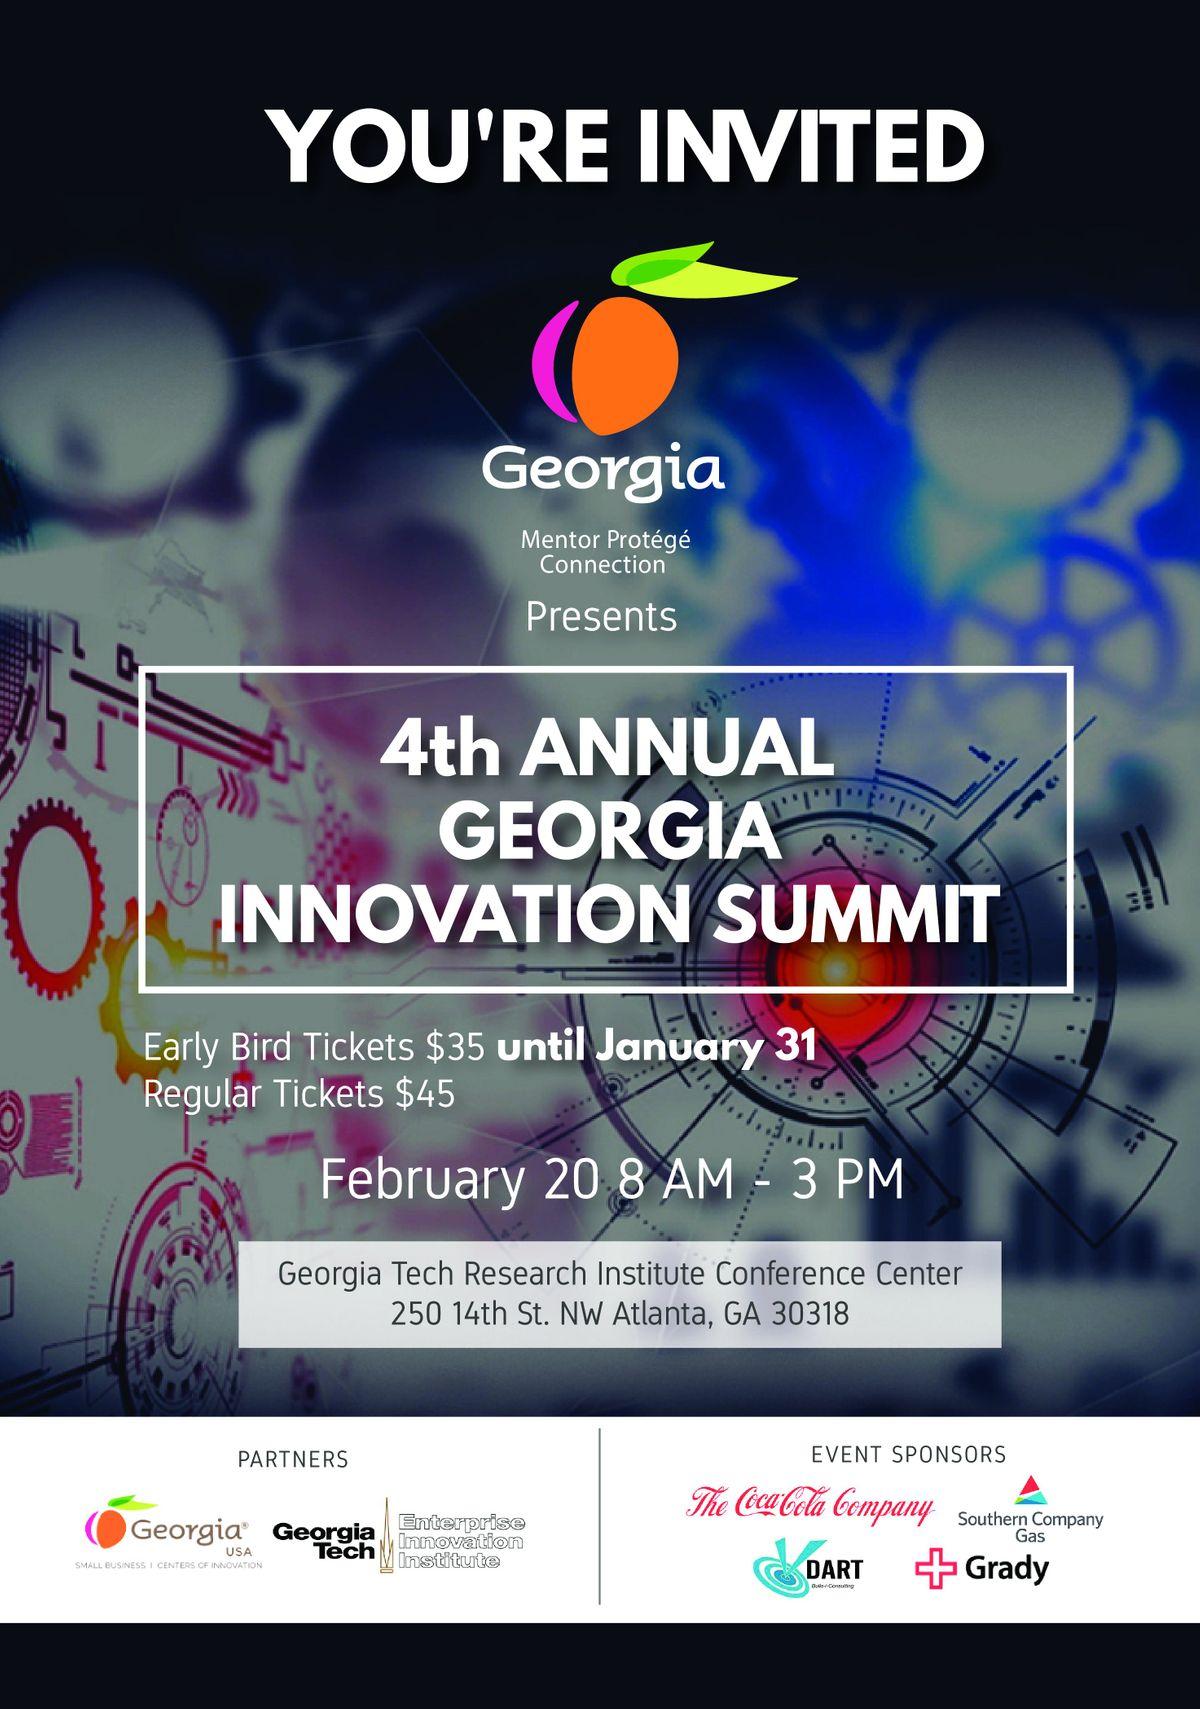 4th Annual Georgia Innovation Summit 2019